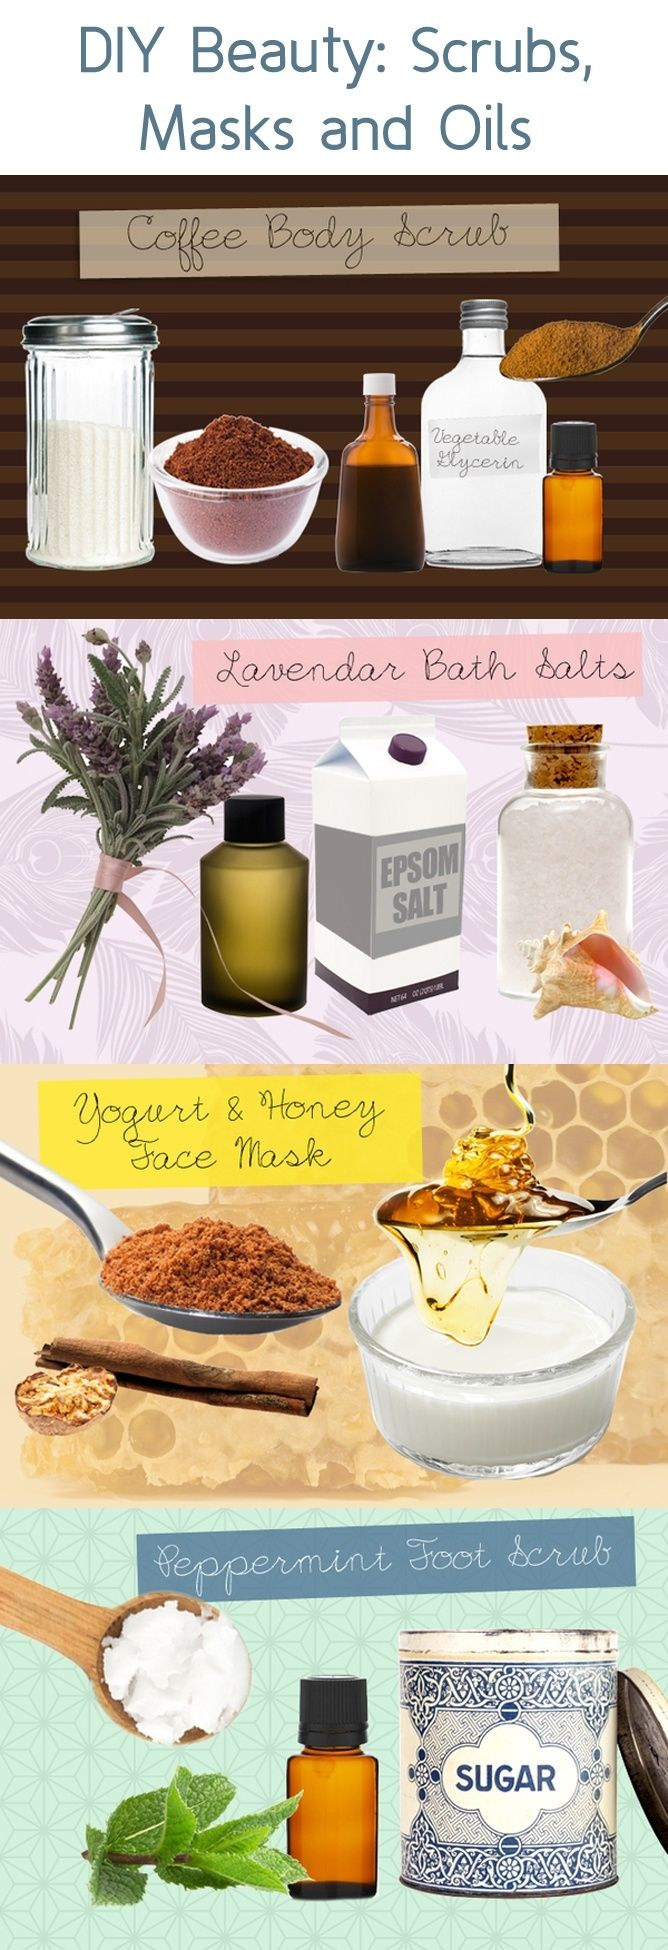 DIY Beauty Scrubs Masks and Oils via lovethispic #Beauty #Scrubs #Masks #Oils